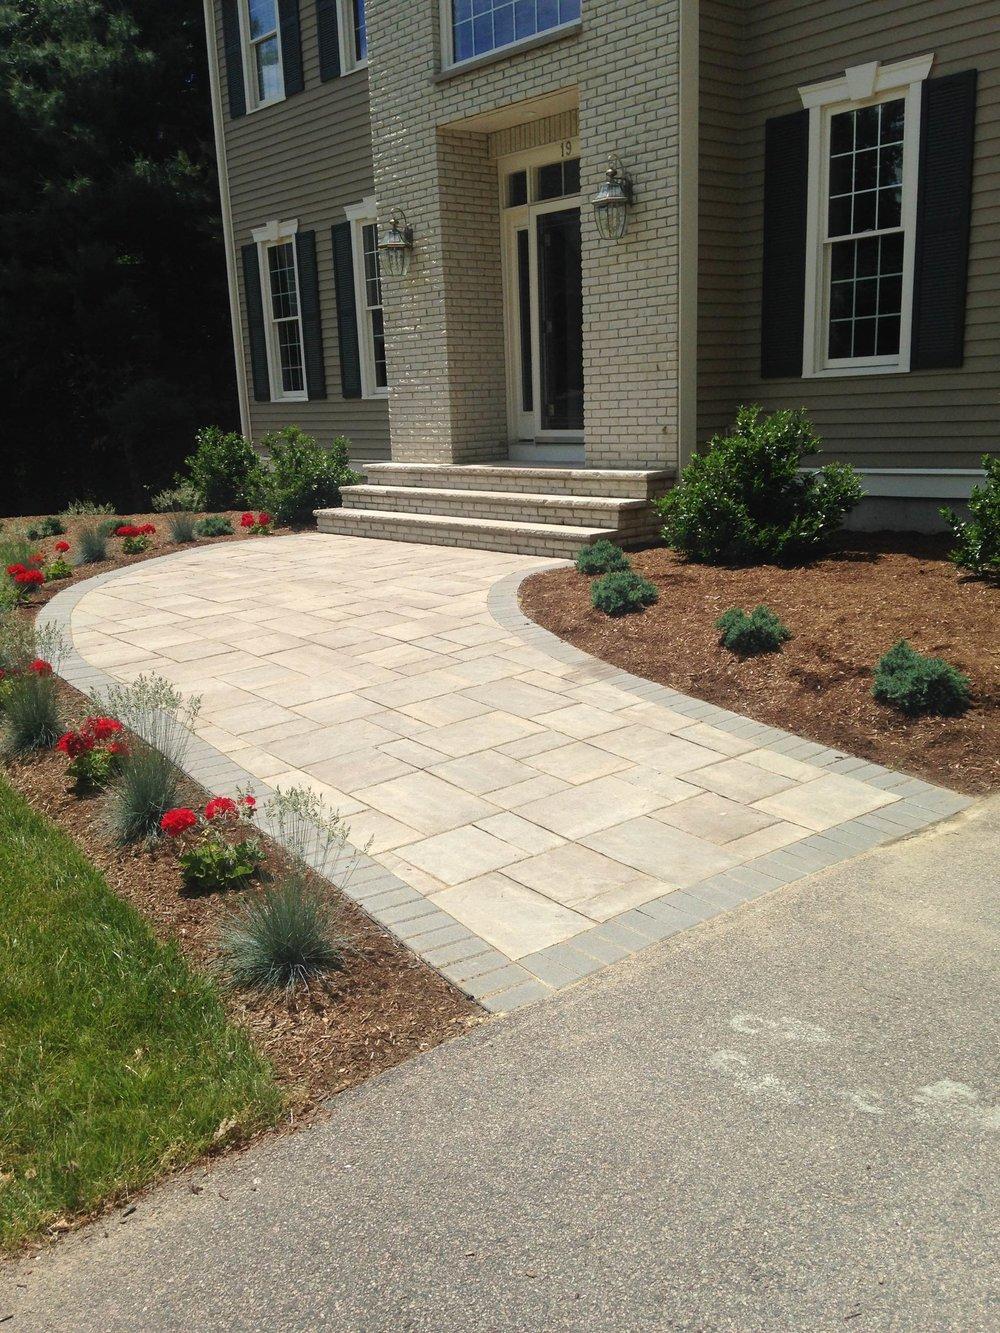 Professional walkway and patio installation in Weston Massachusetts